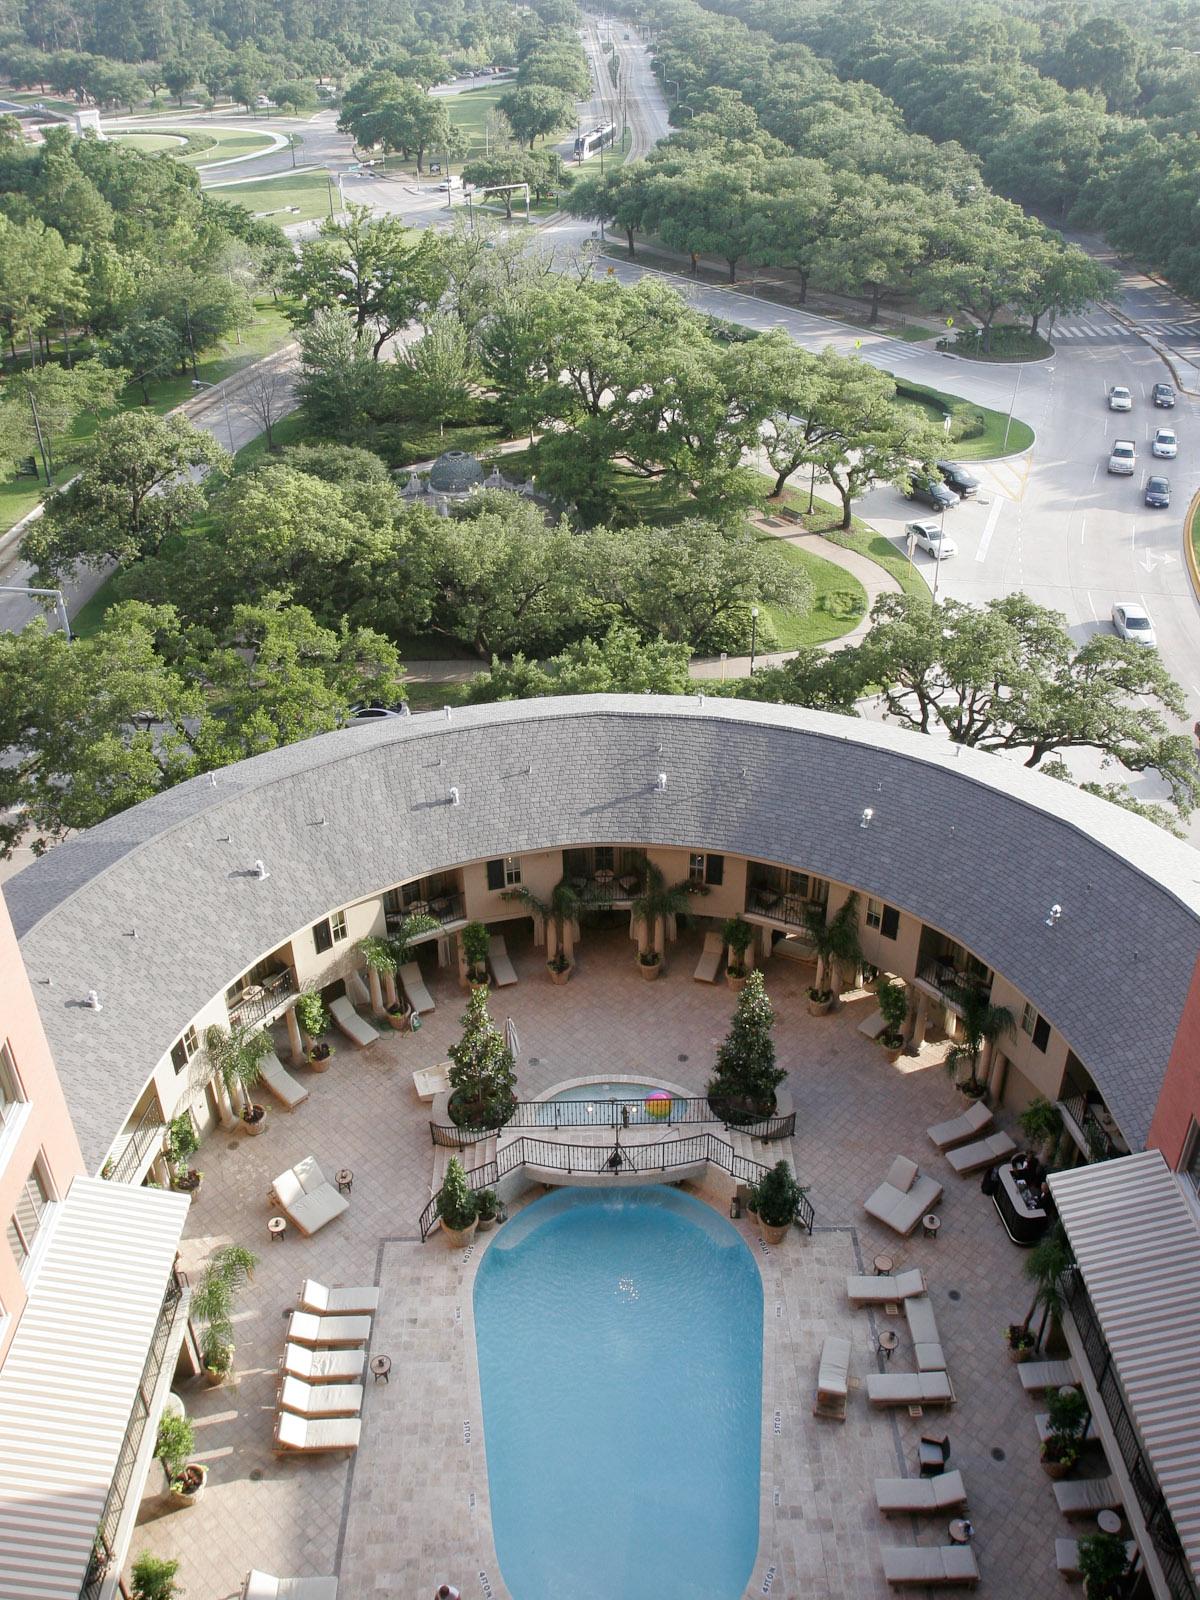 Places-Hotels/Spas-Hotel ZaZa-pool